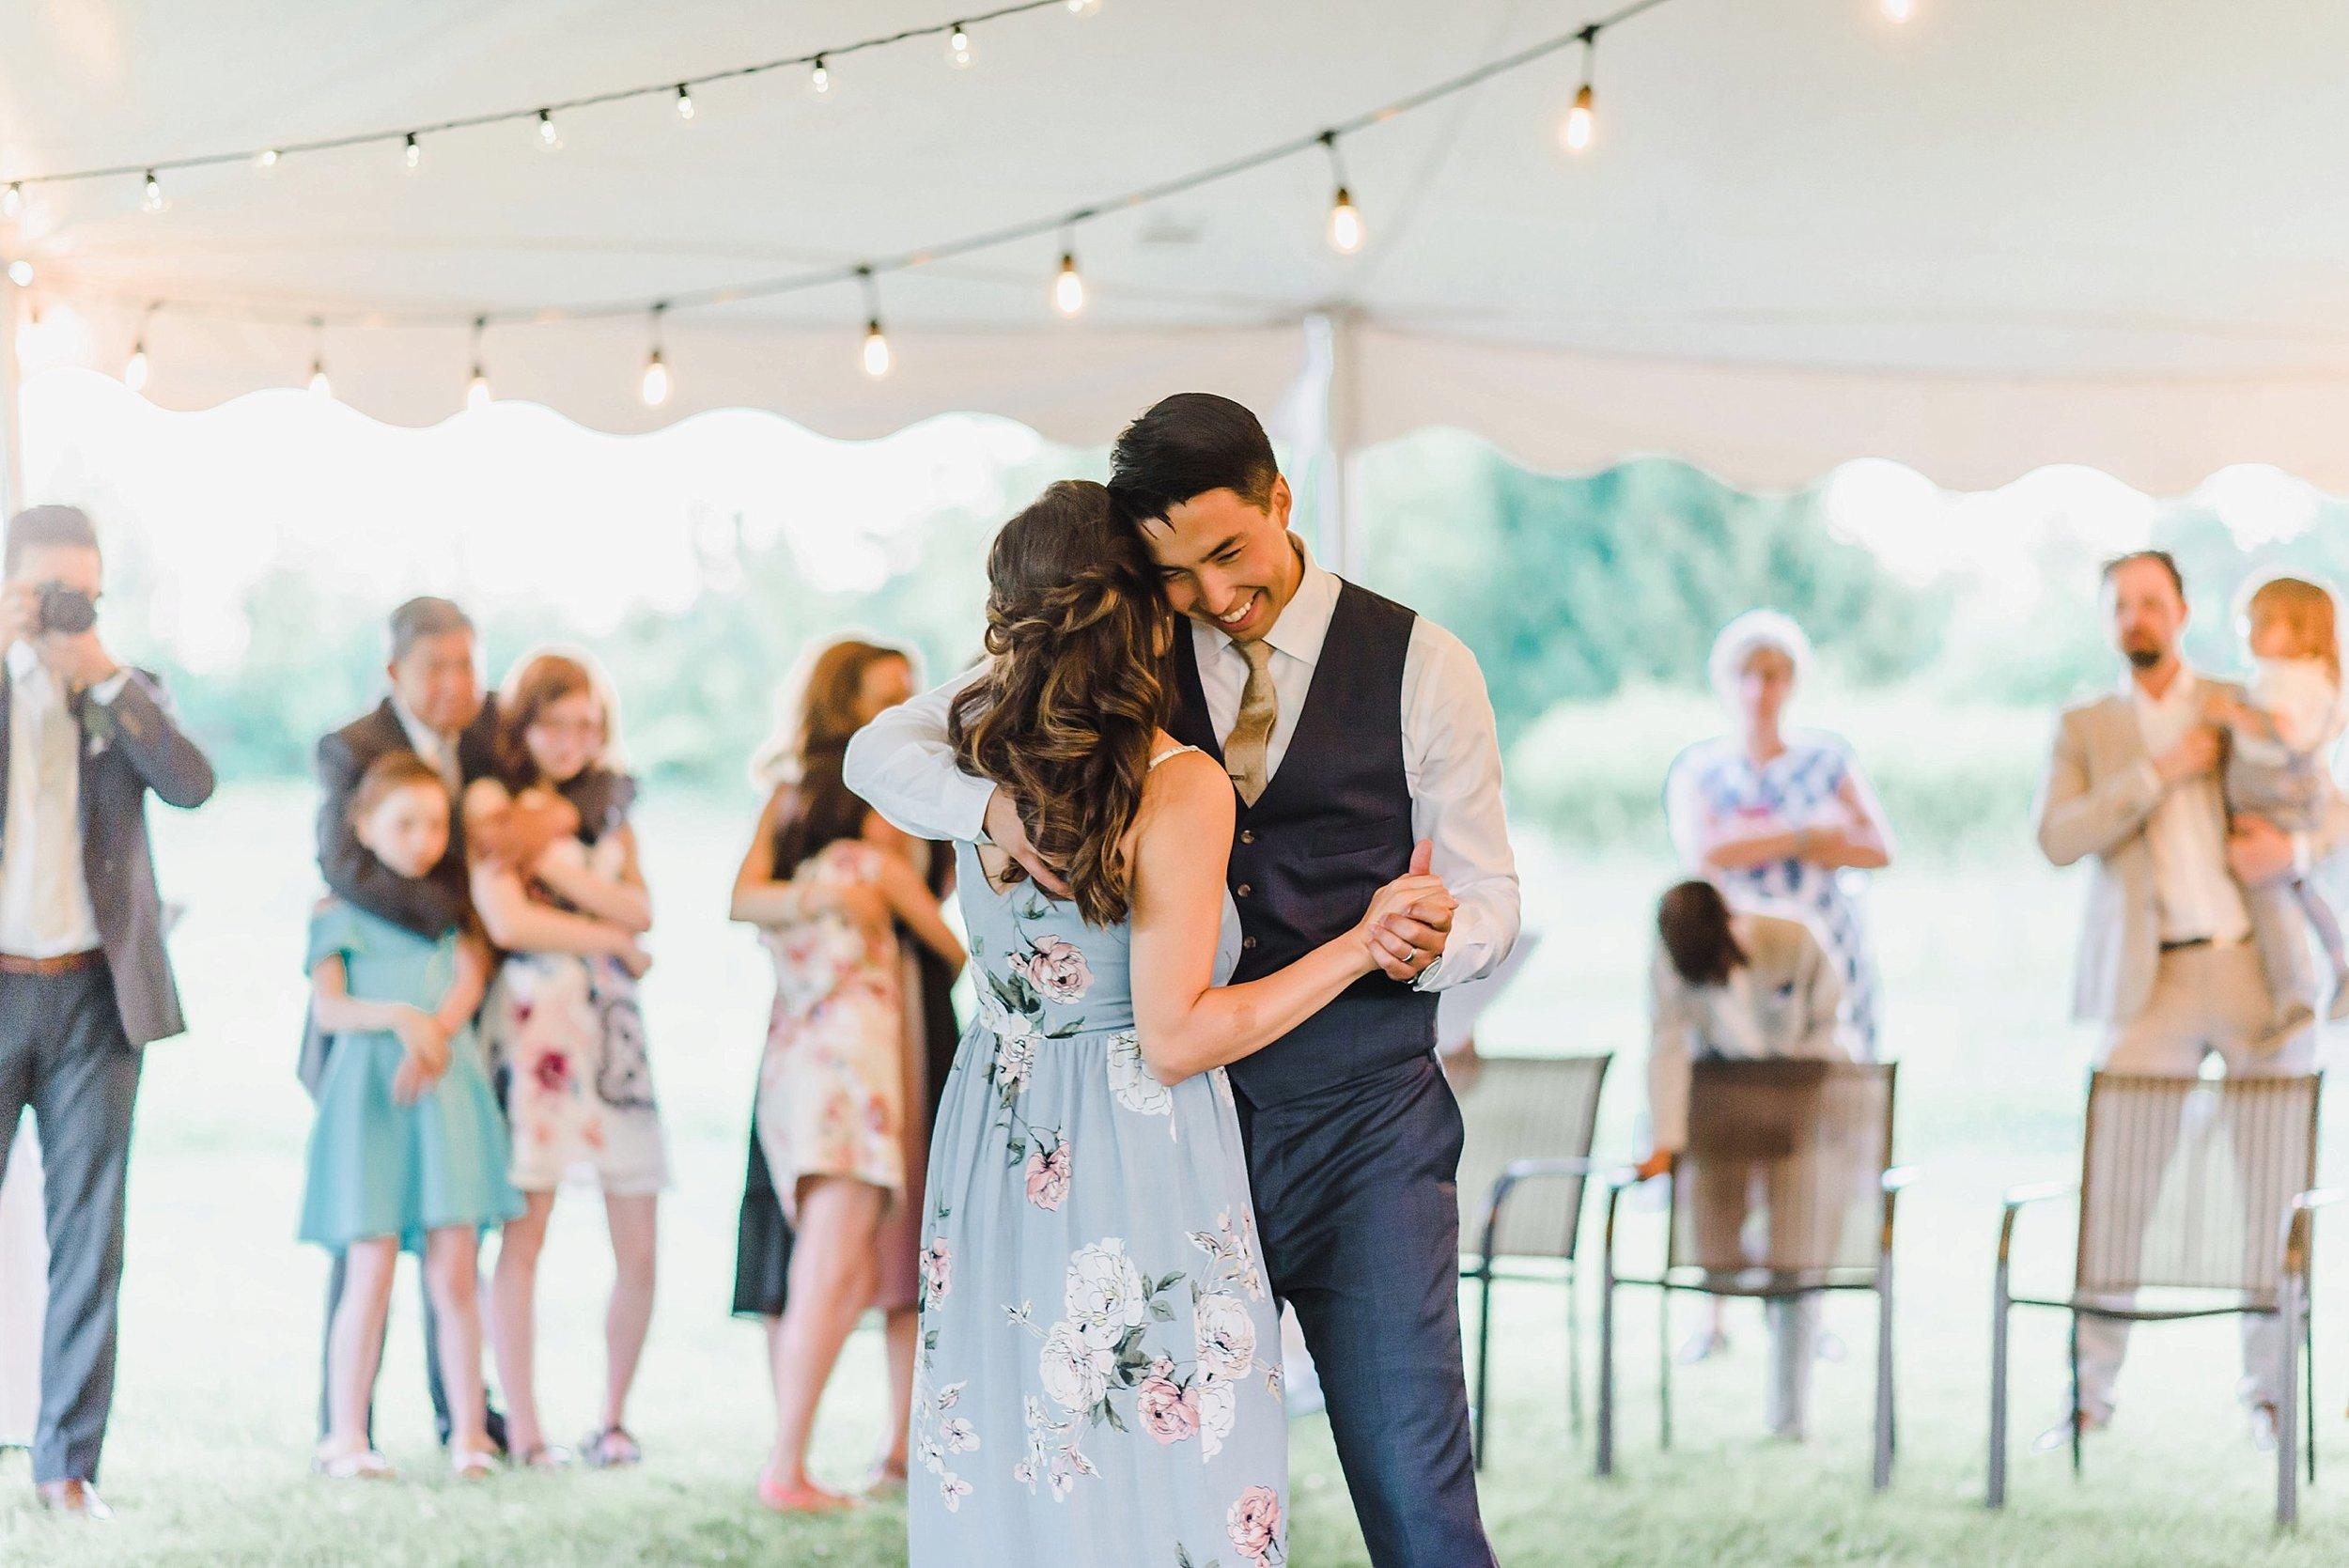 light airy indie fine art ottawa wedding photographer | Ali and Batoul Photography_0915.jpg